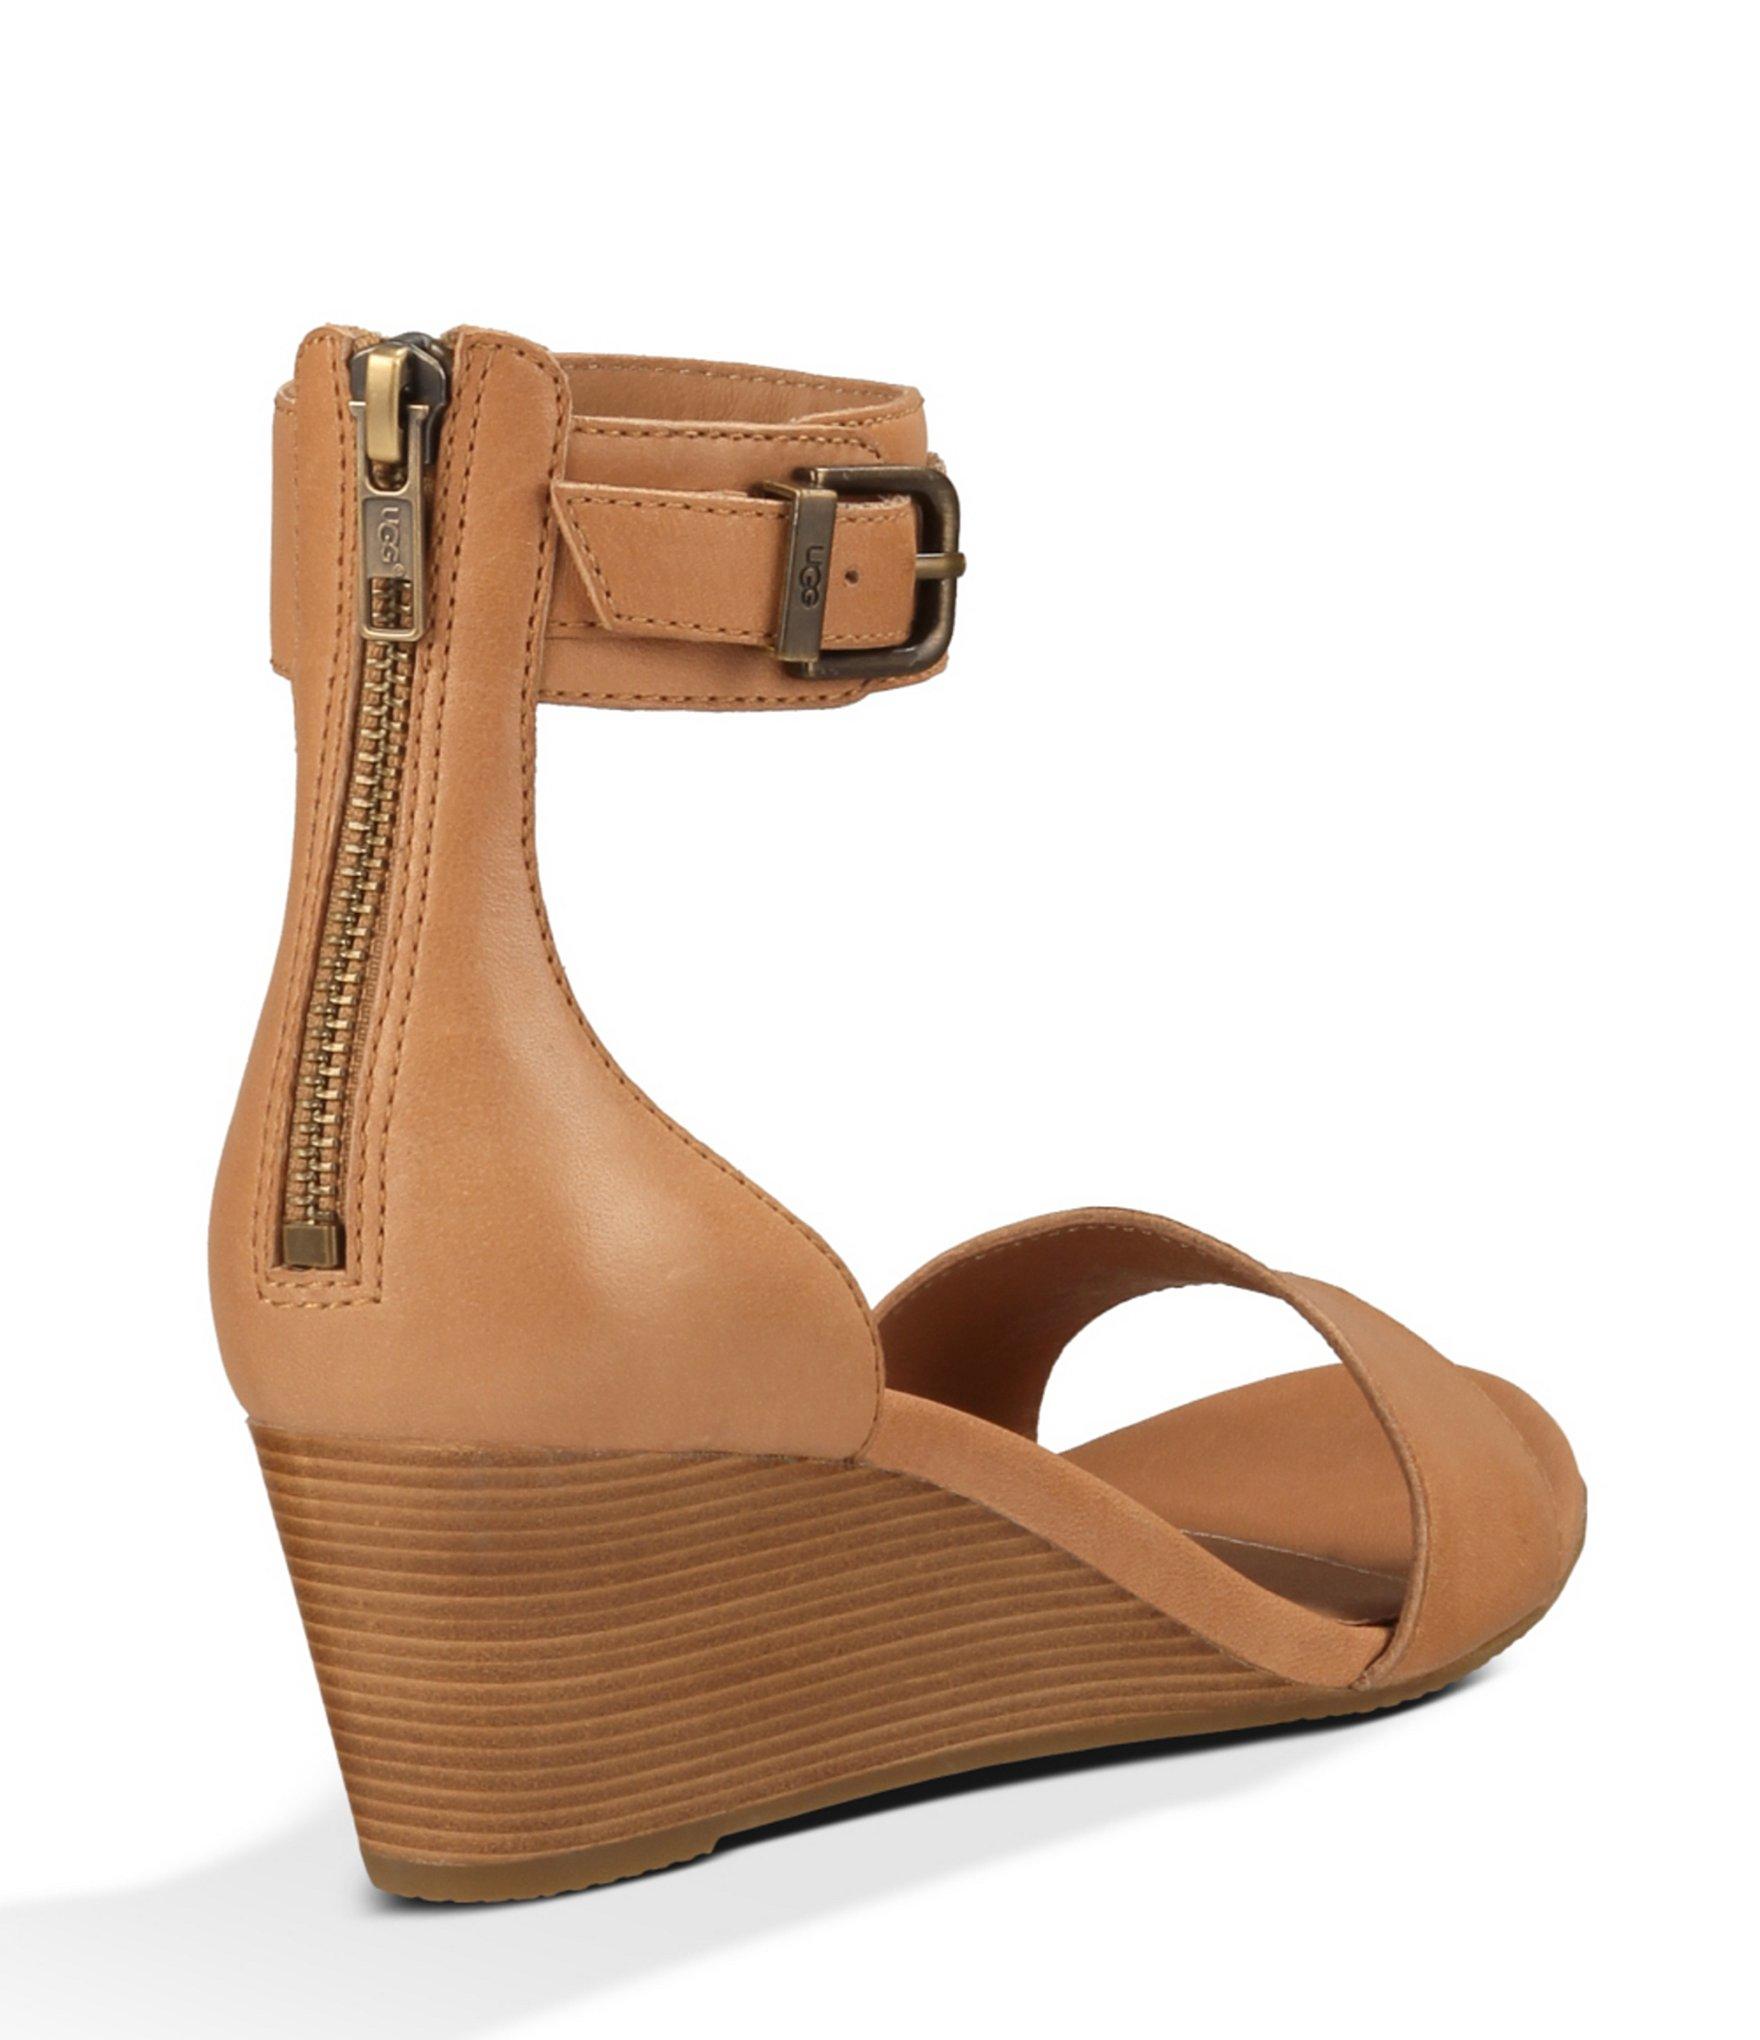 685a6054b6b UGG Brown ® Char Wedge Sandals